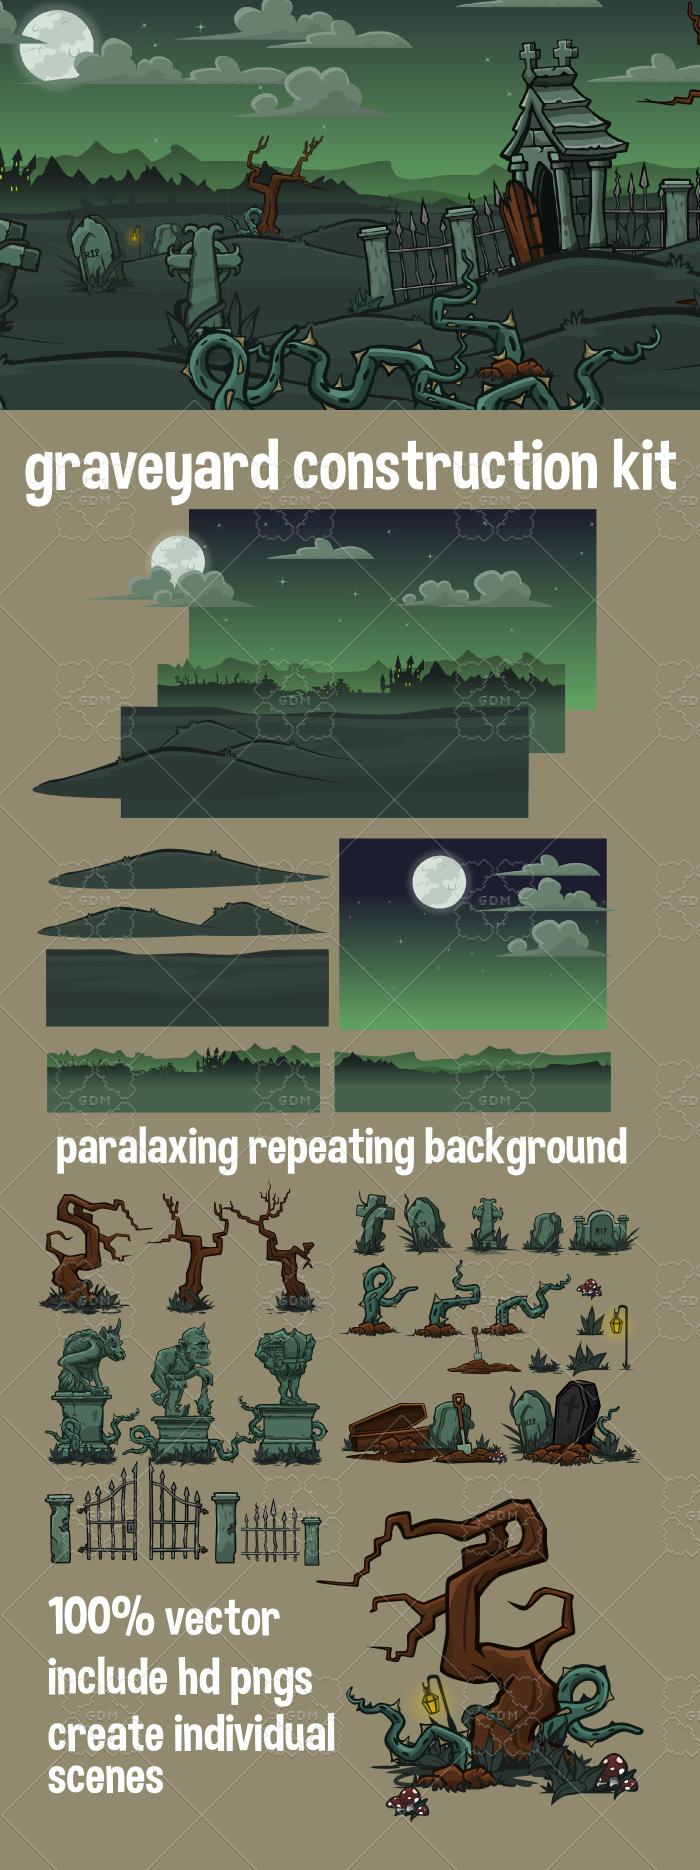 Graveyard scene creation kit